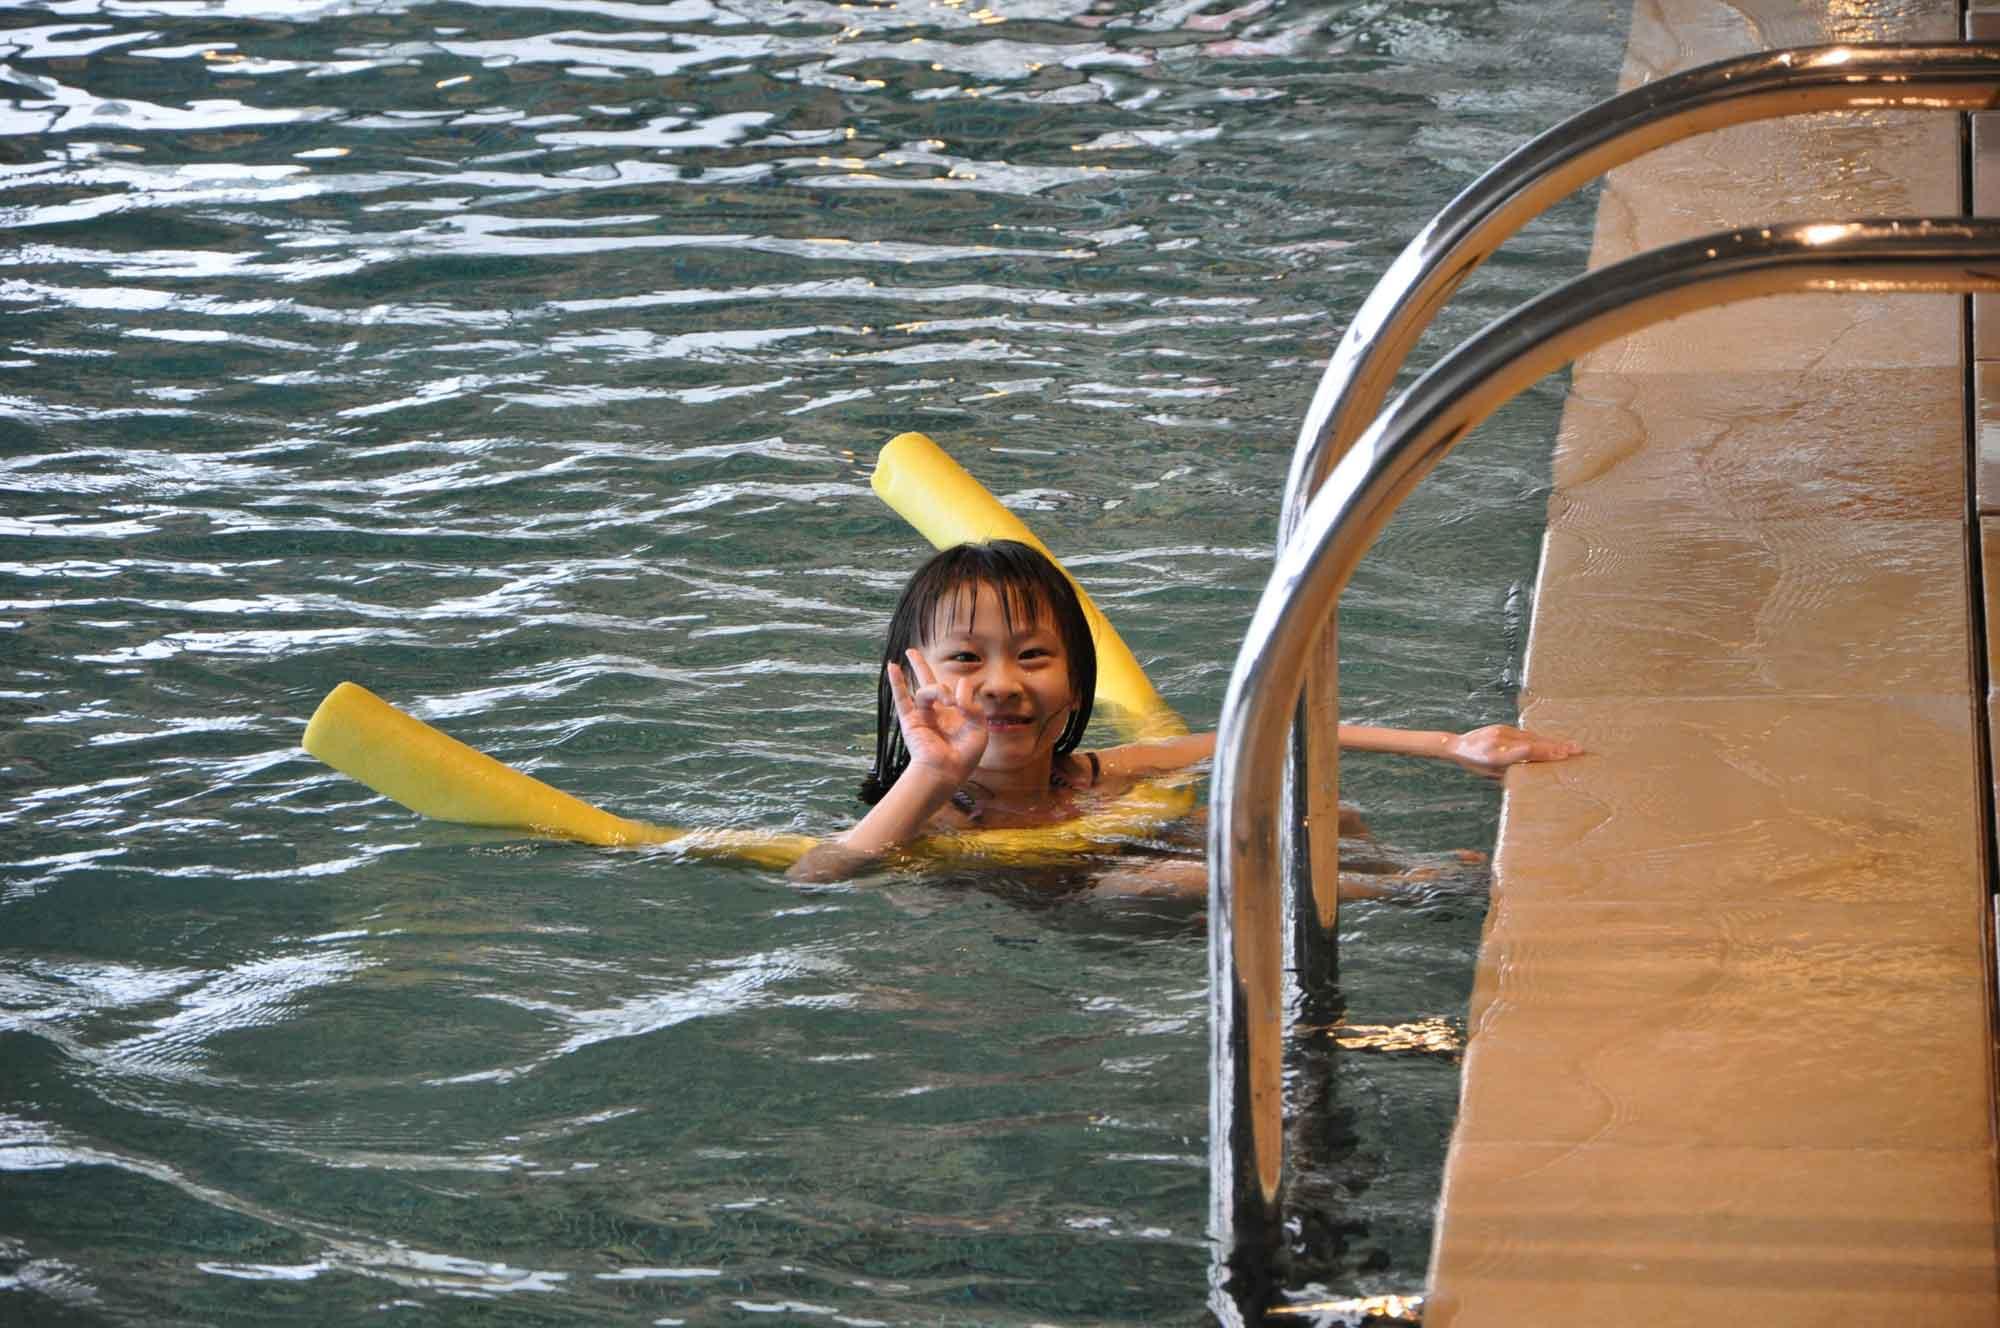 Altira Macau swimming pool and young model